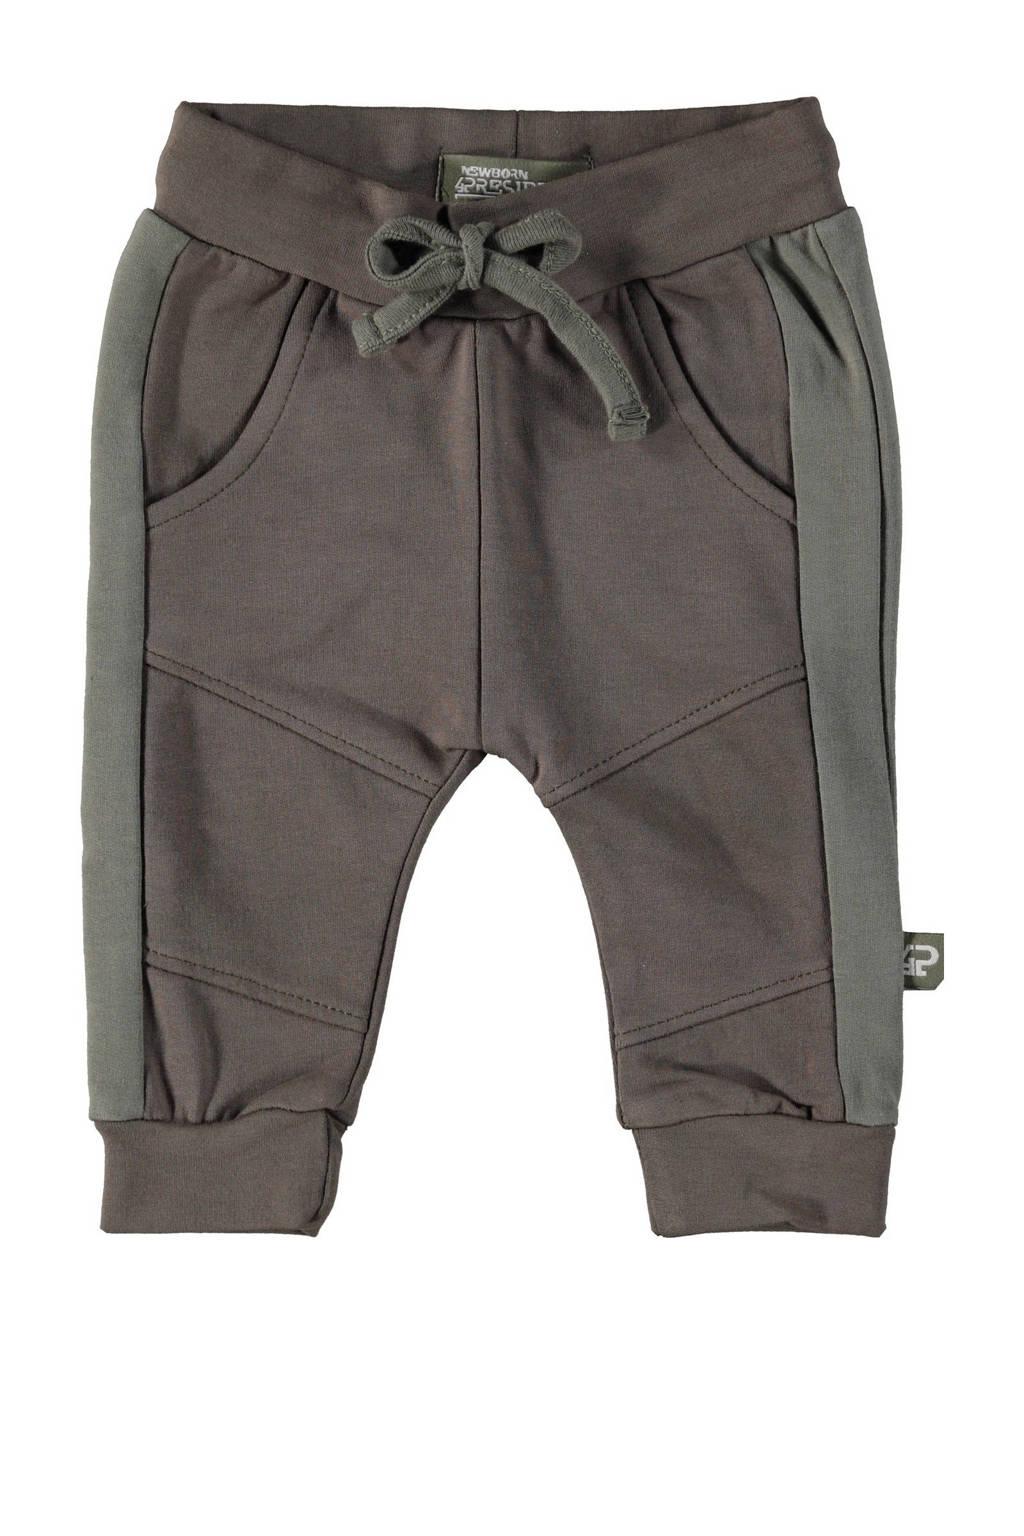 4PRESIDENT baby tapered fit broek Apollo donkergroen, Donkergroen